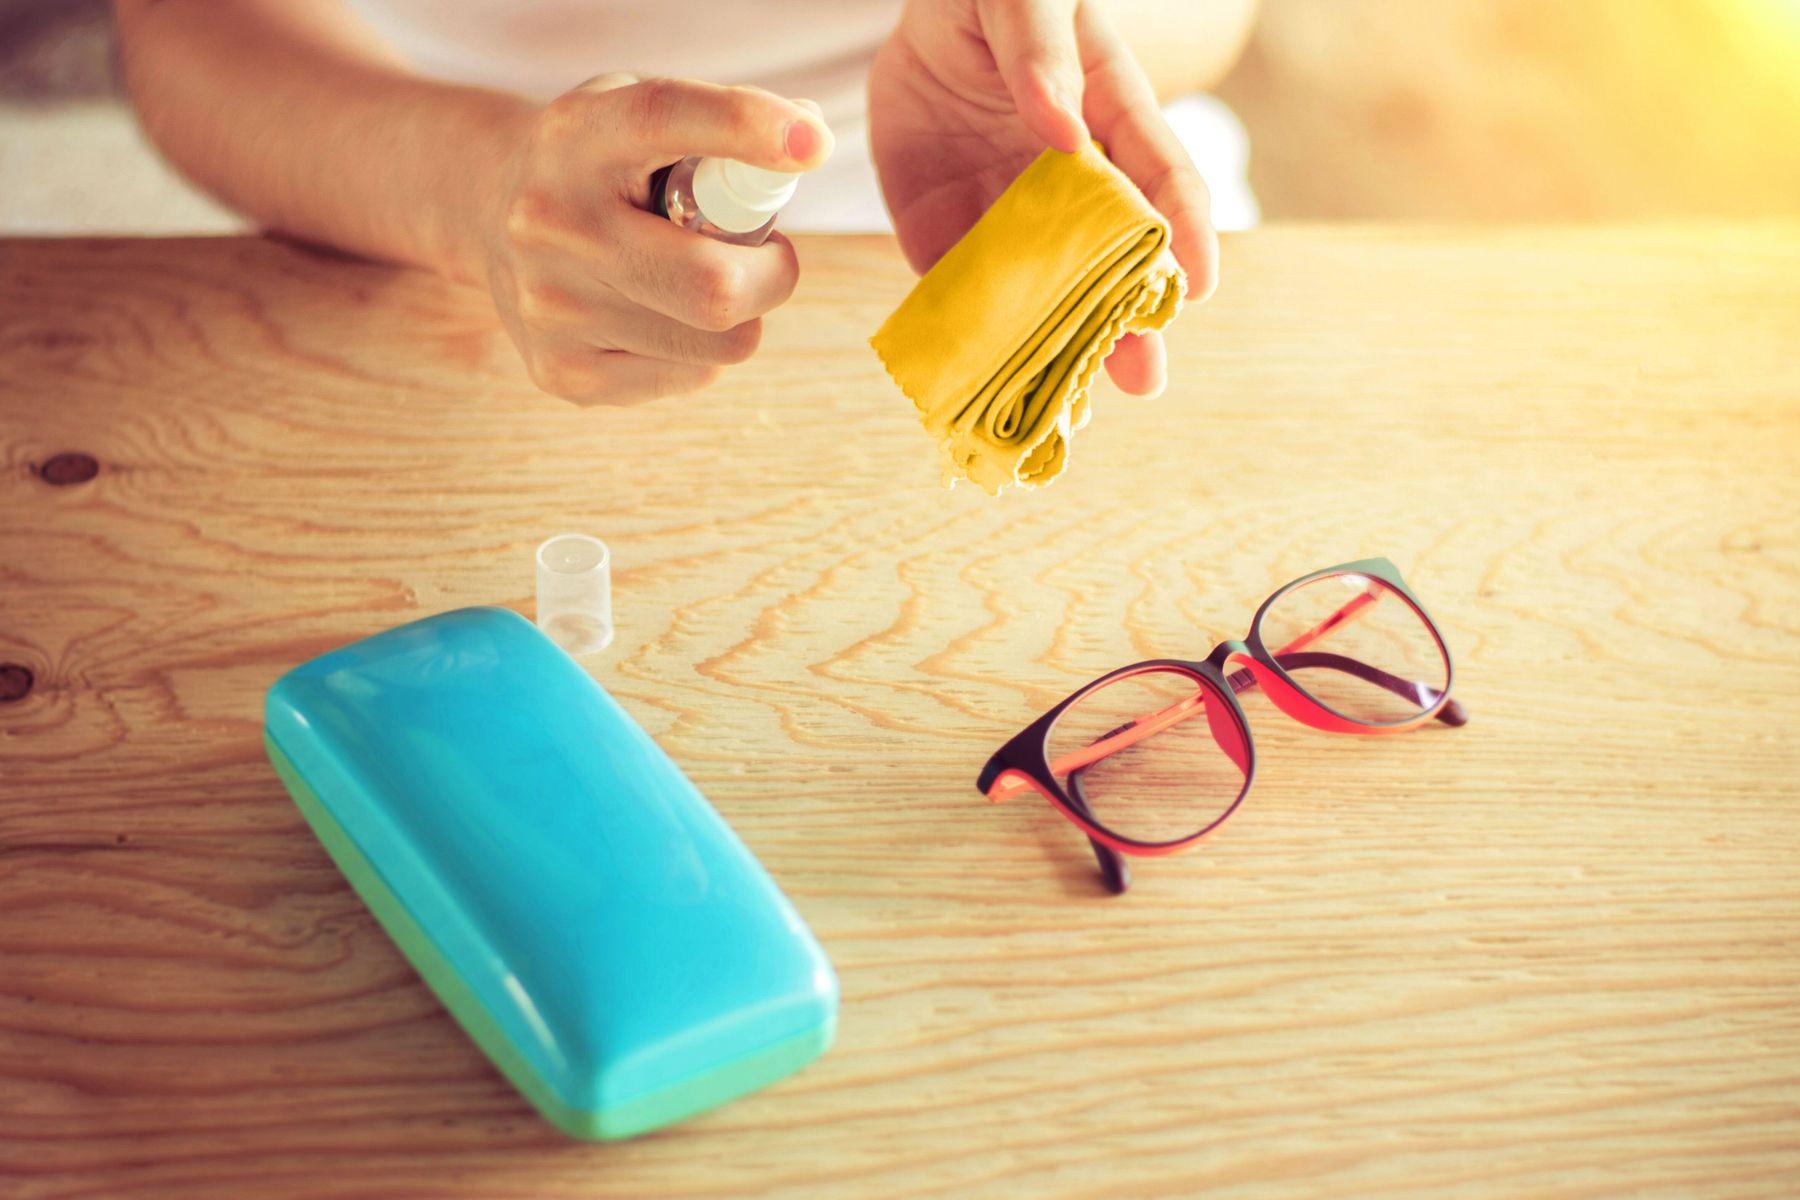 how to clean eyeglasses